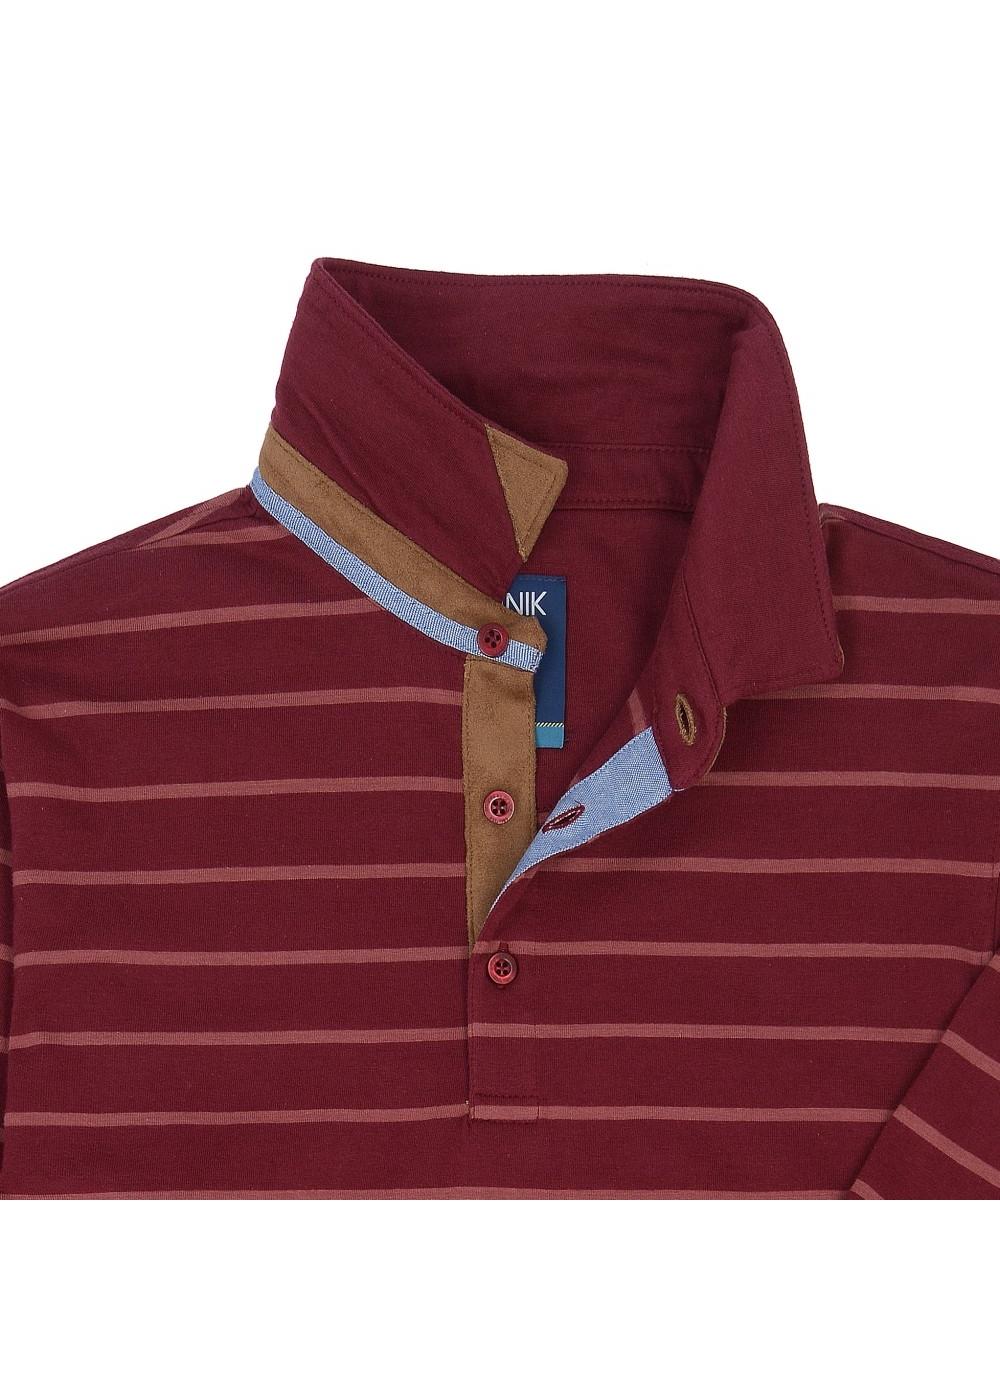 Koszula polo POLMT-0012-49(Z17)